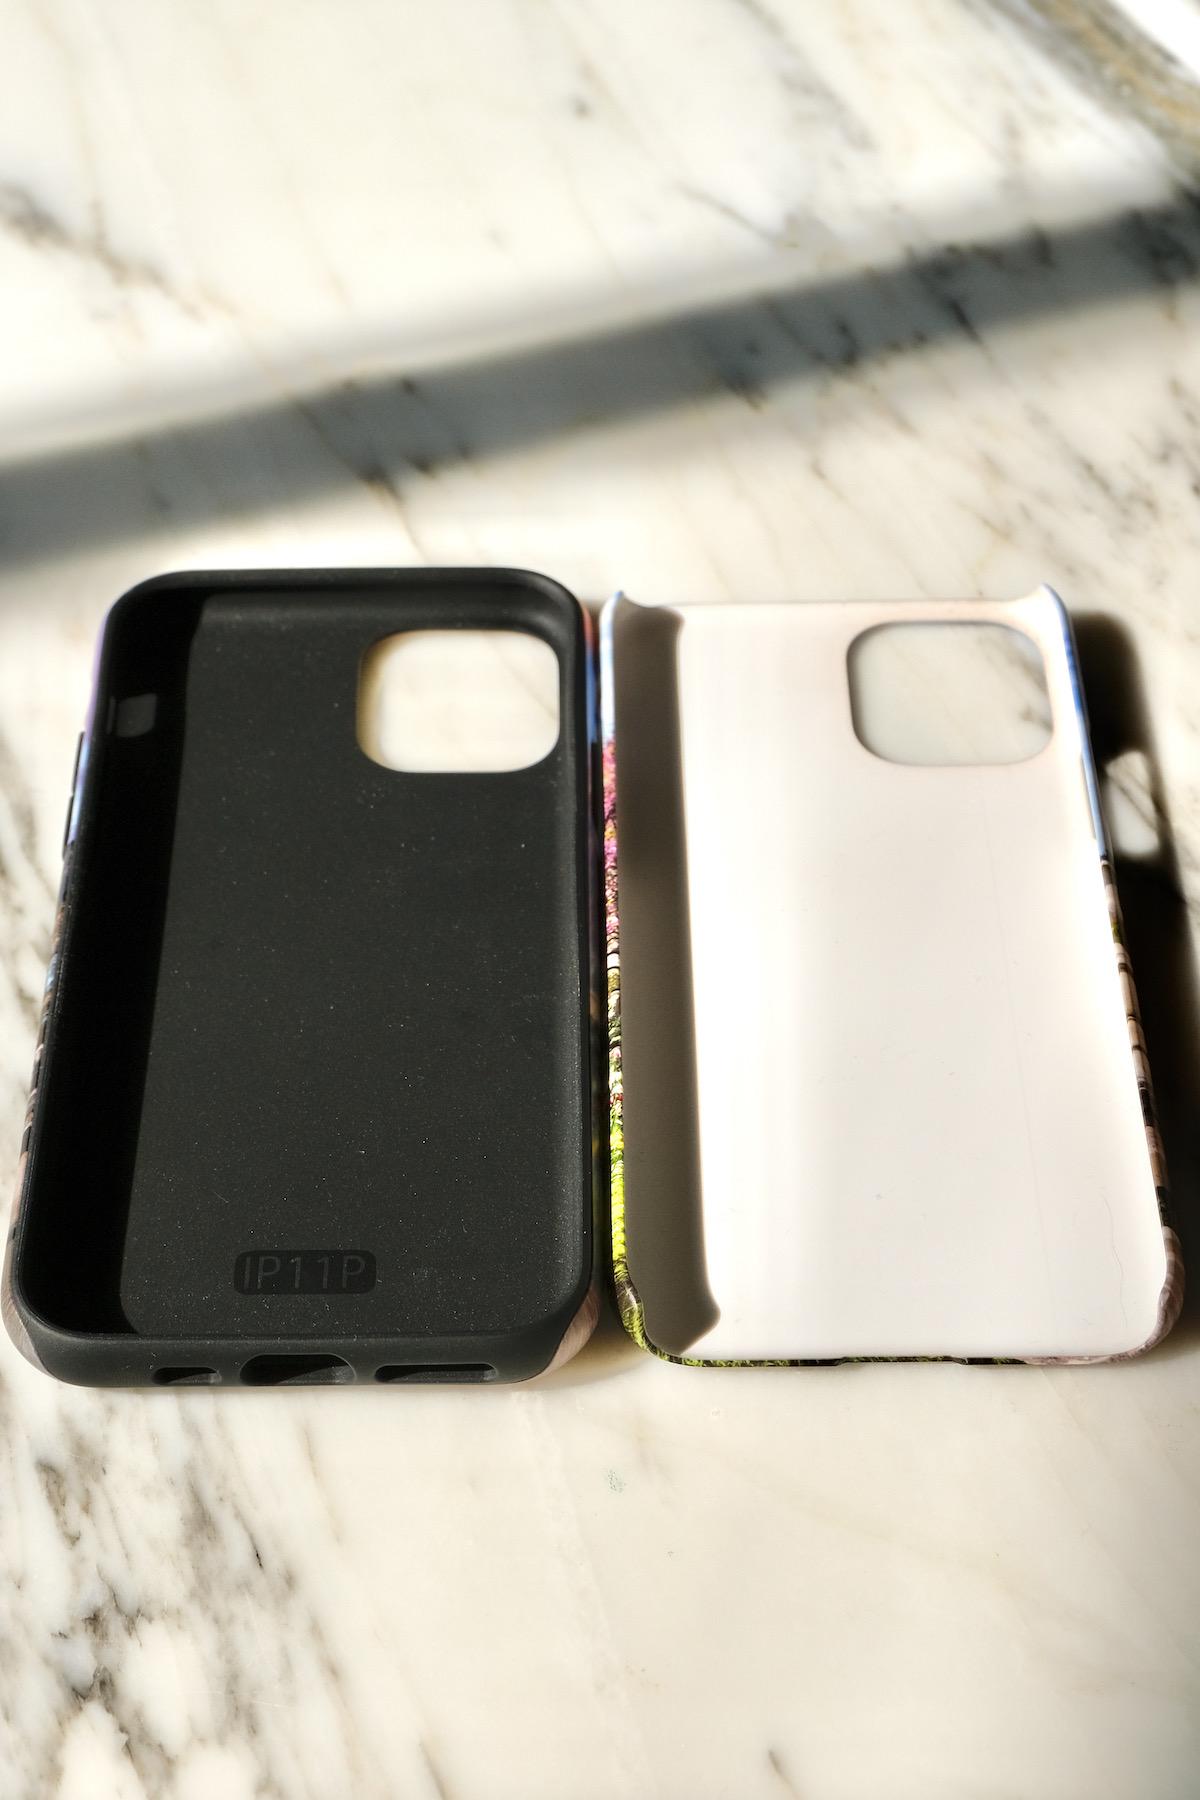 tough vs slim paris and normandy phone cases